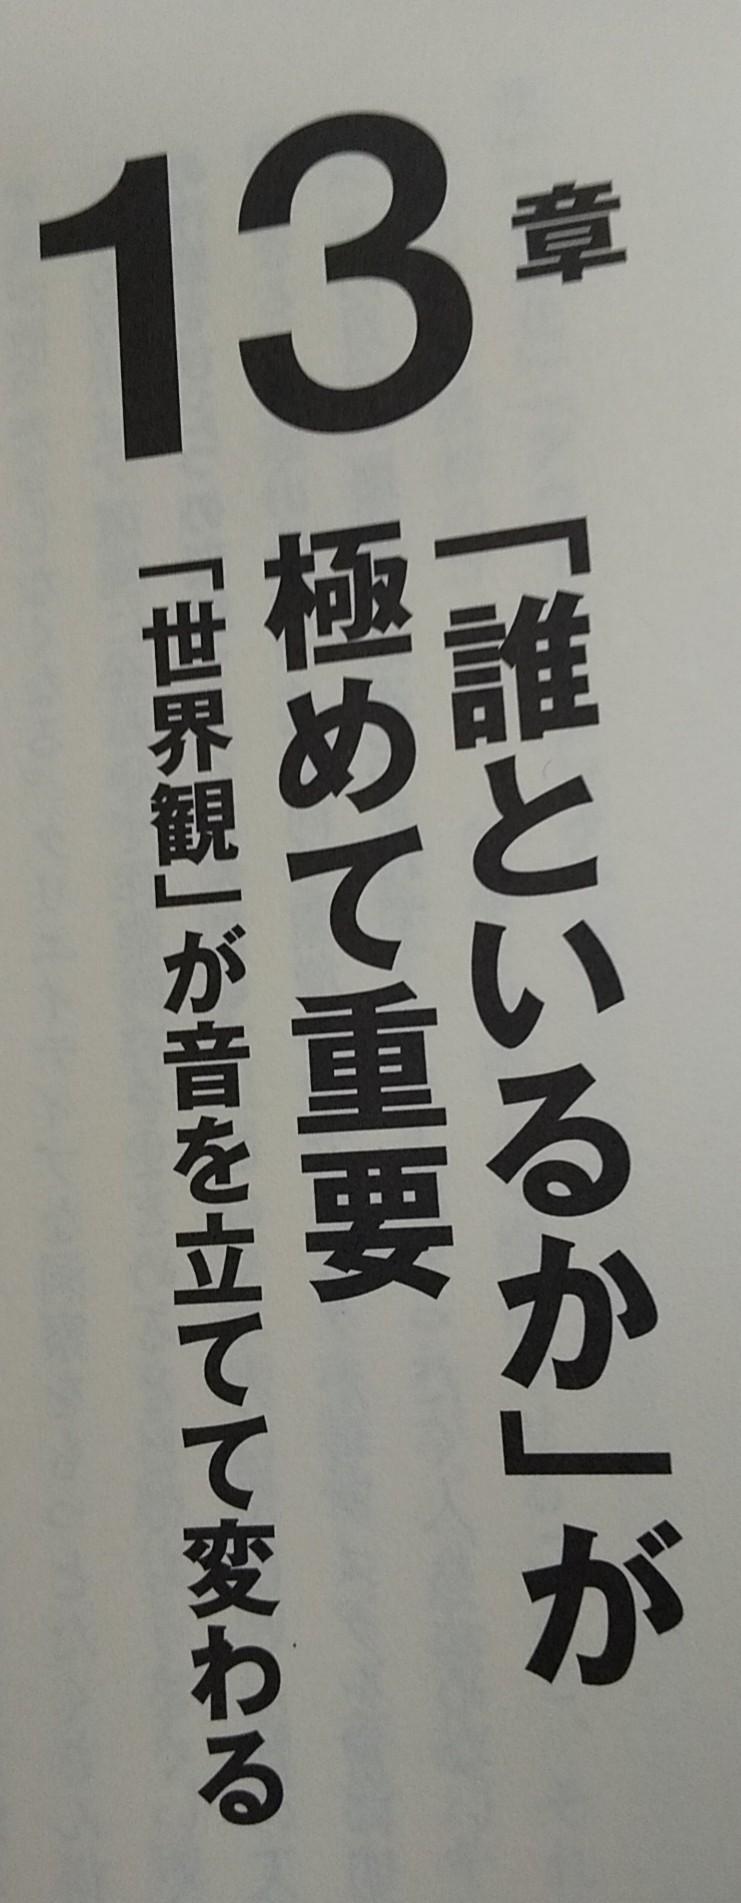 No.4579 3月23日(月):「自分を変える」のではなく「環境を変える」 ~意志力など役に立たない~_b0113993_14054090.jpg